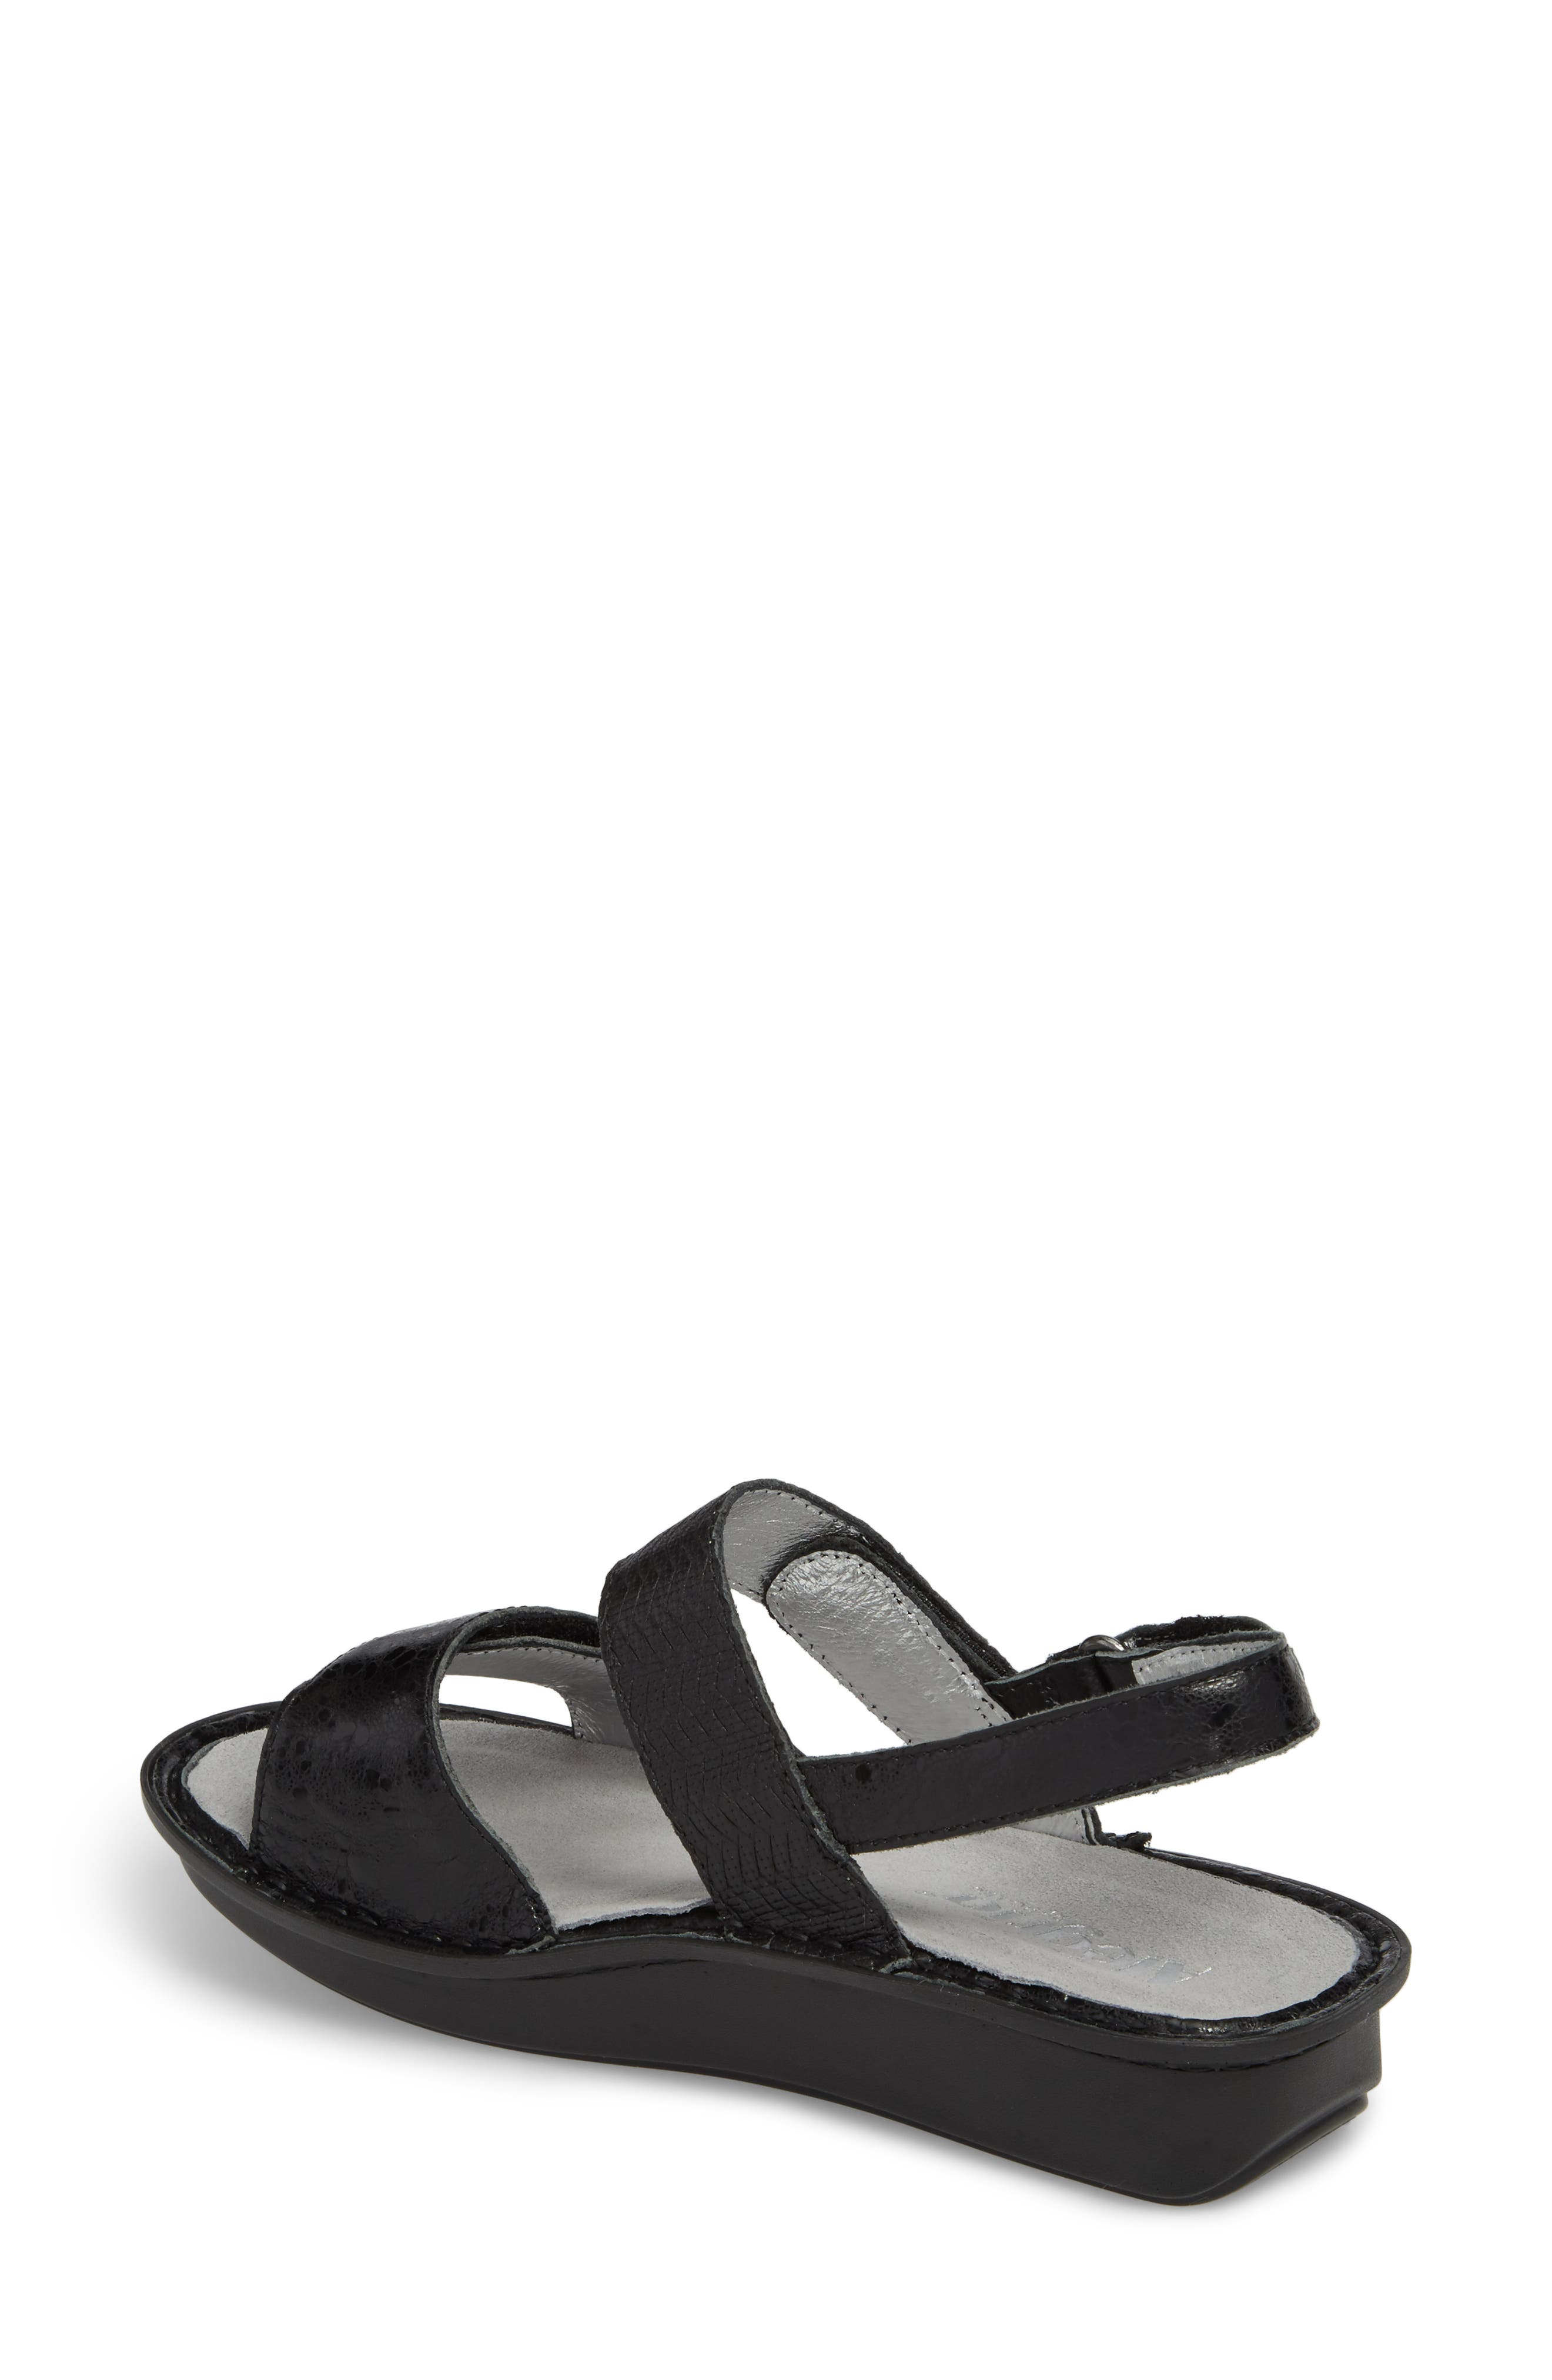 ALEGRIA, 'Verona' Sandal, Alternate thumbnail 2, color, BRAIDED BLACK LEATHER